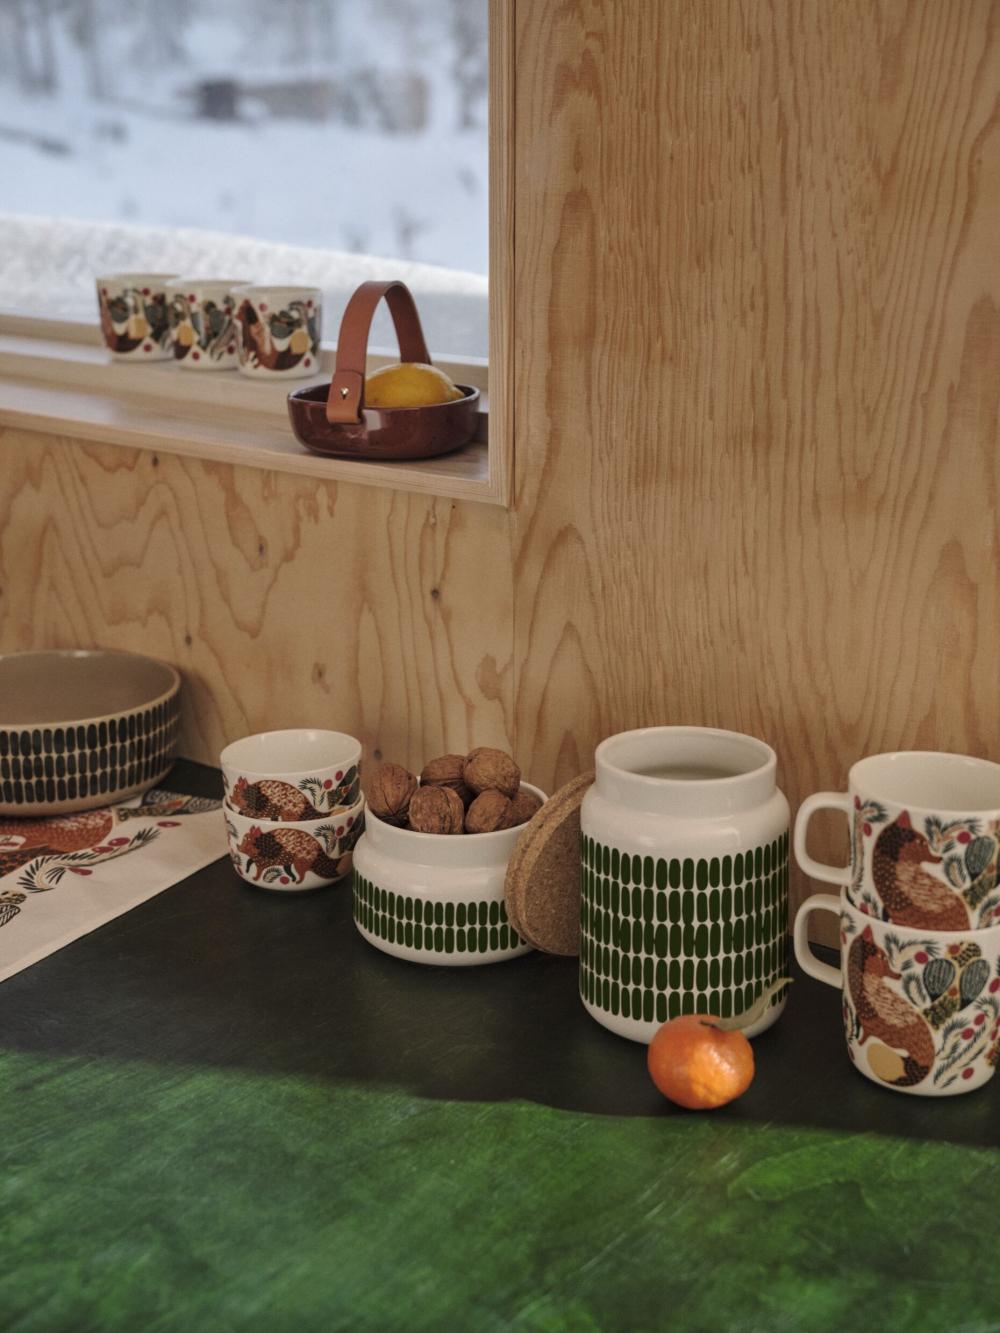 Marimekko Fall/Winter 2021 Collection